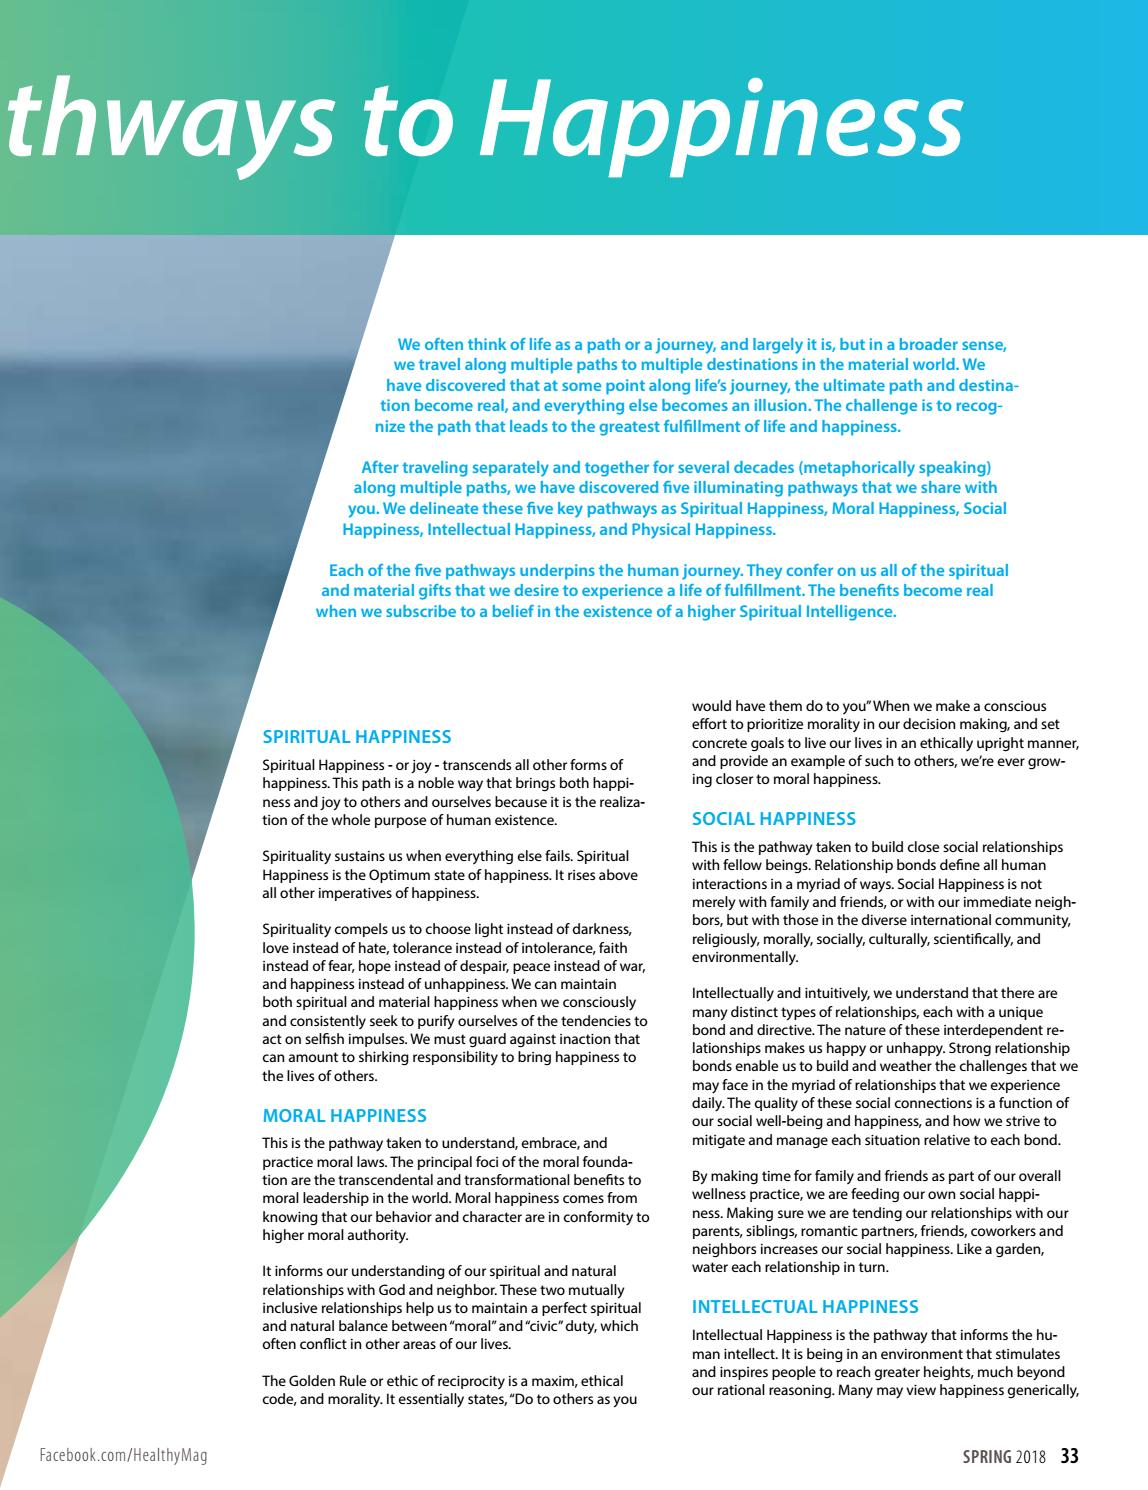 Healthy Magazine | Spring 2018 by Healthy Magazine - issuu